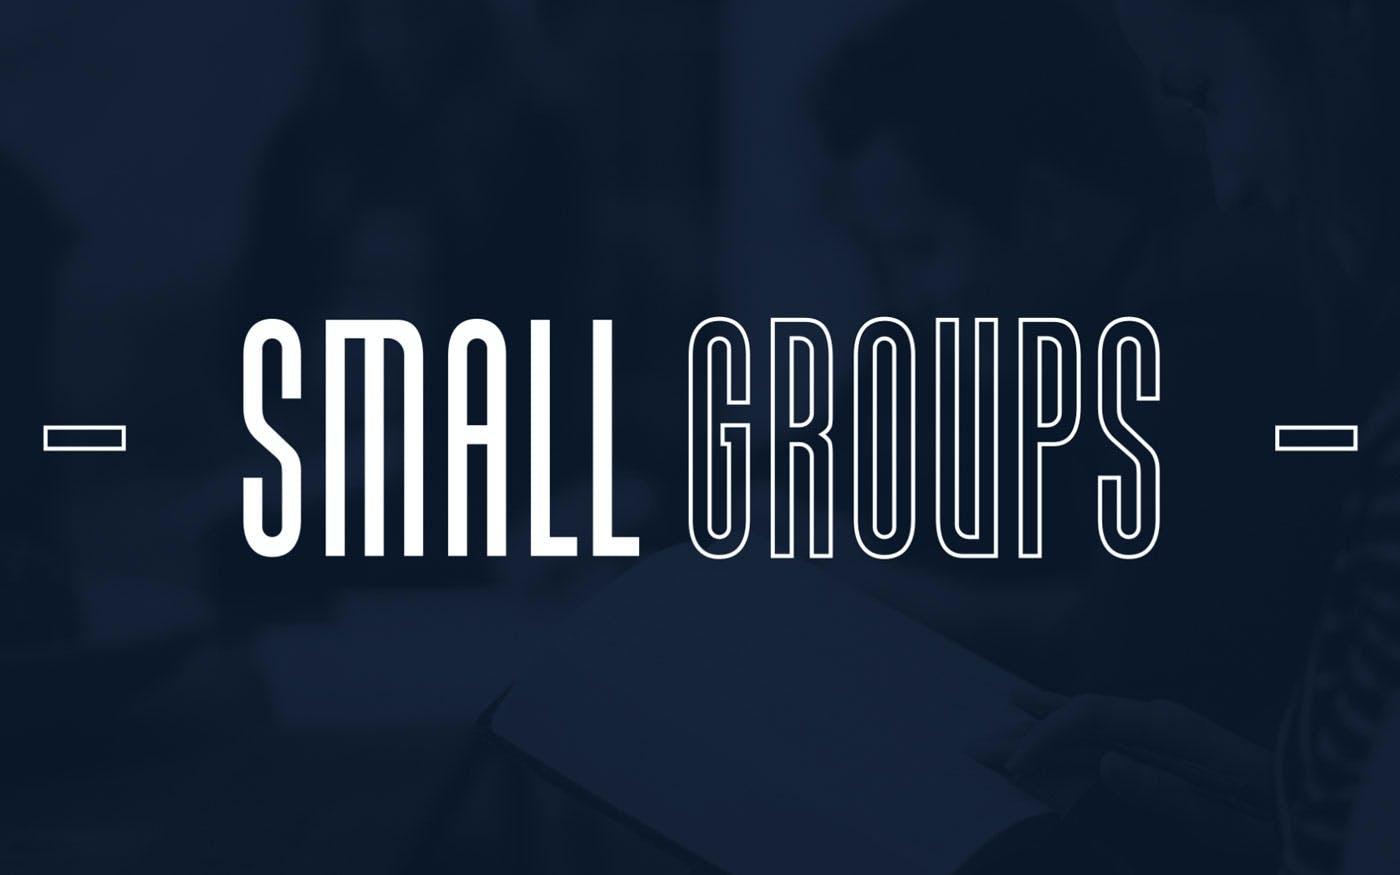 Small groups logo.